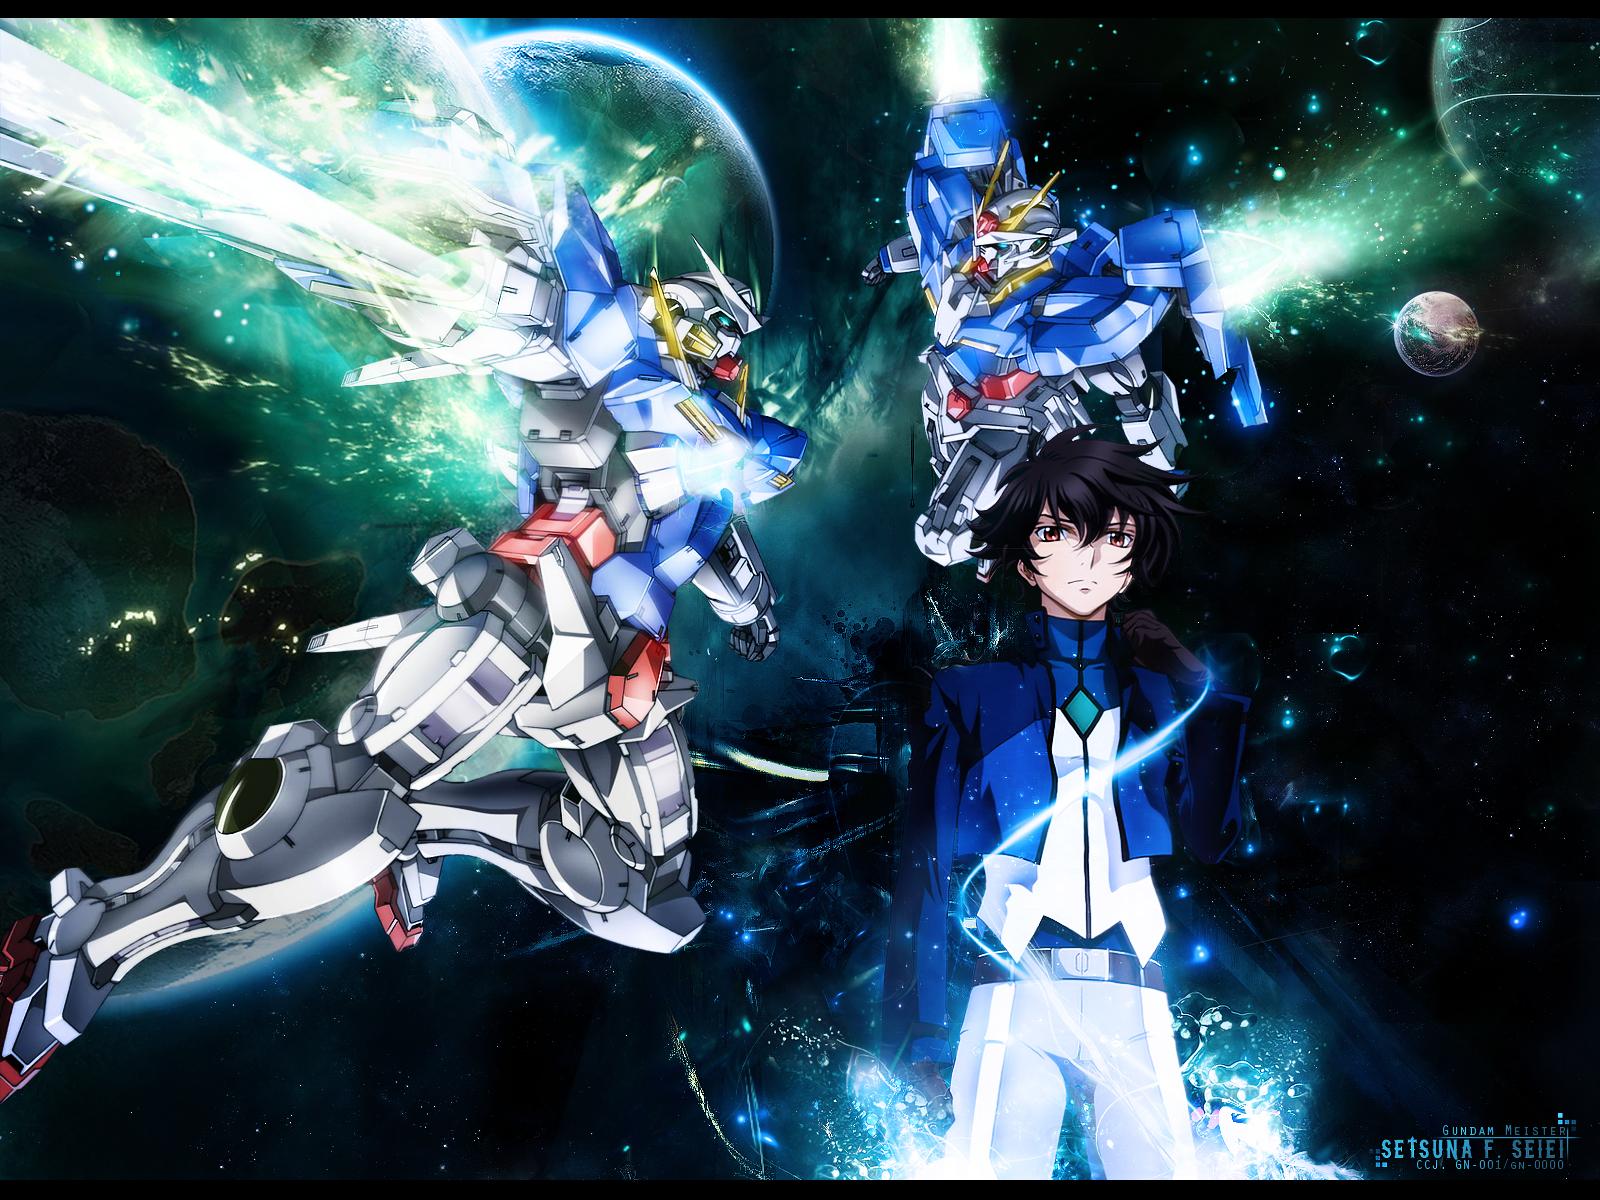 Hd Gundam Themes: [73+] Gundam 00 Wallpaper Hd On WallpaperSafari